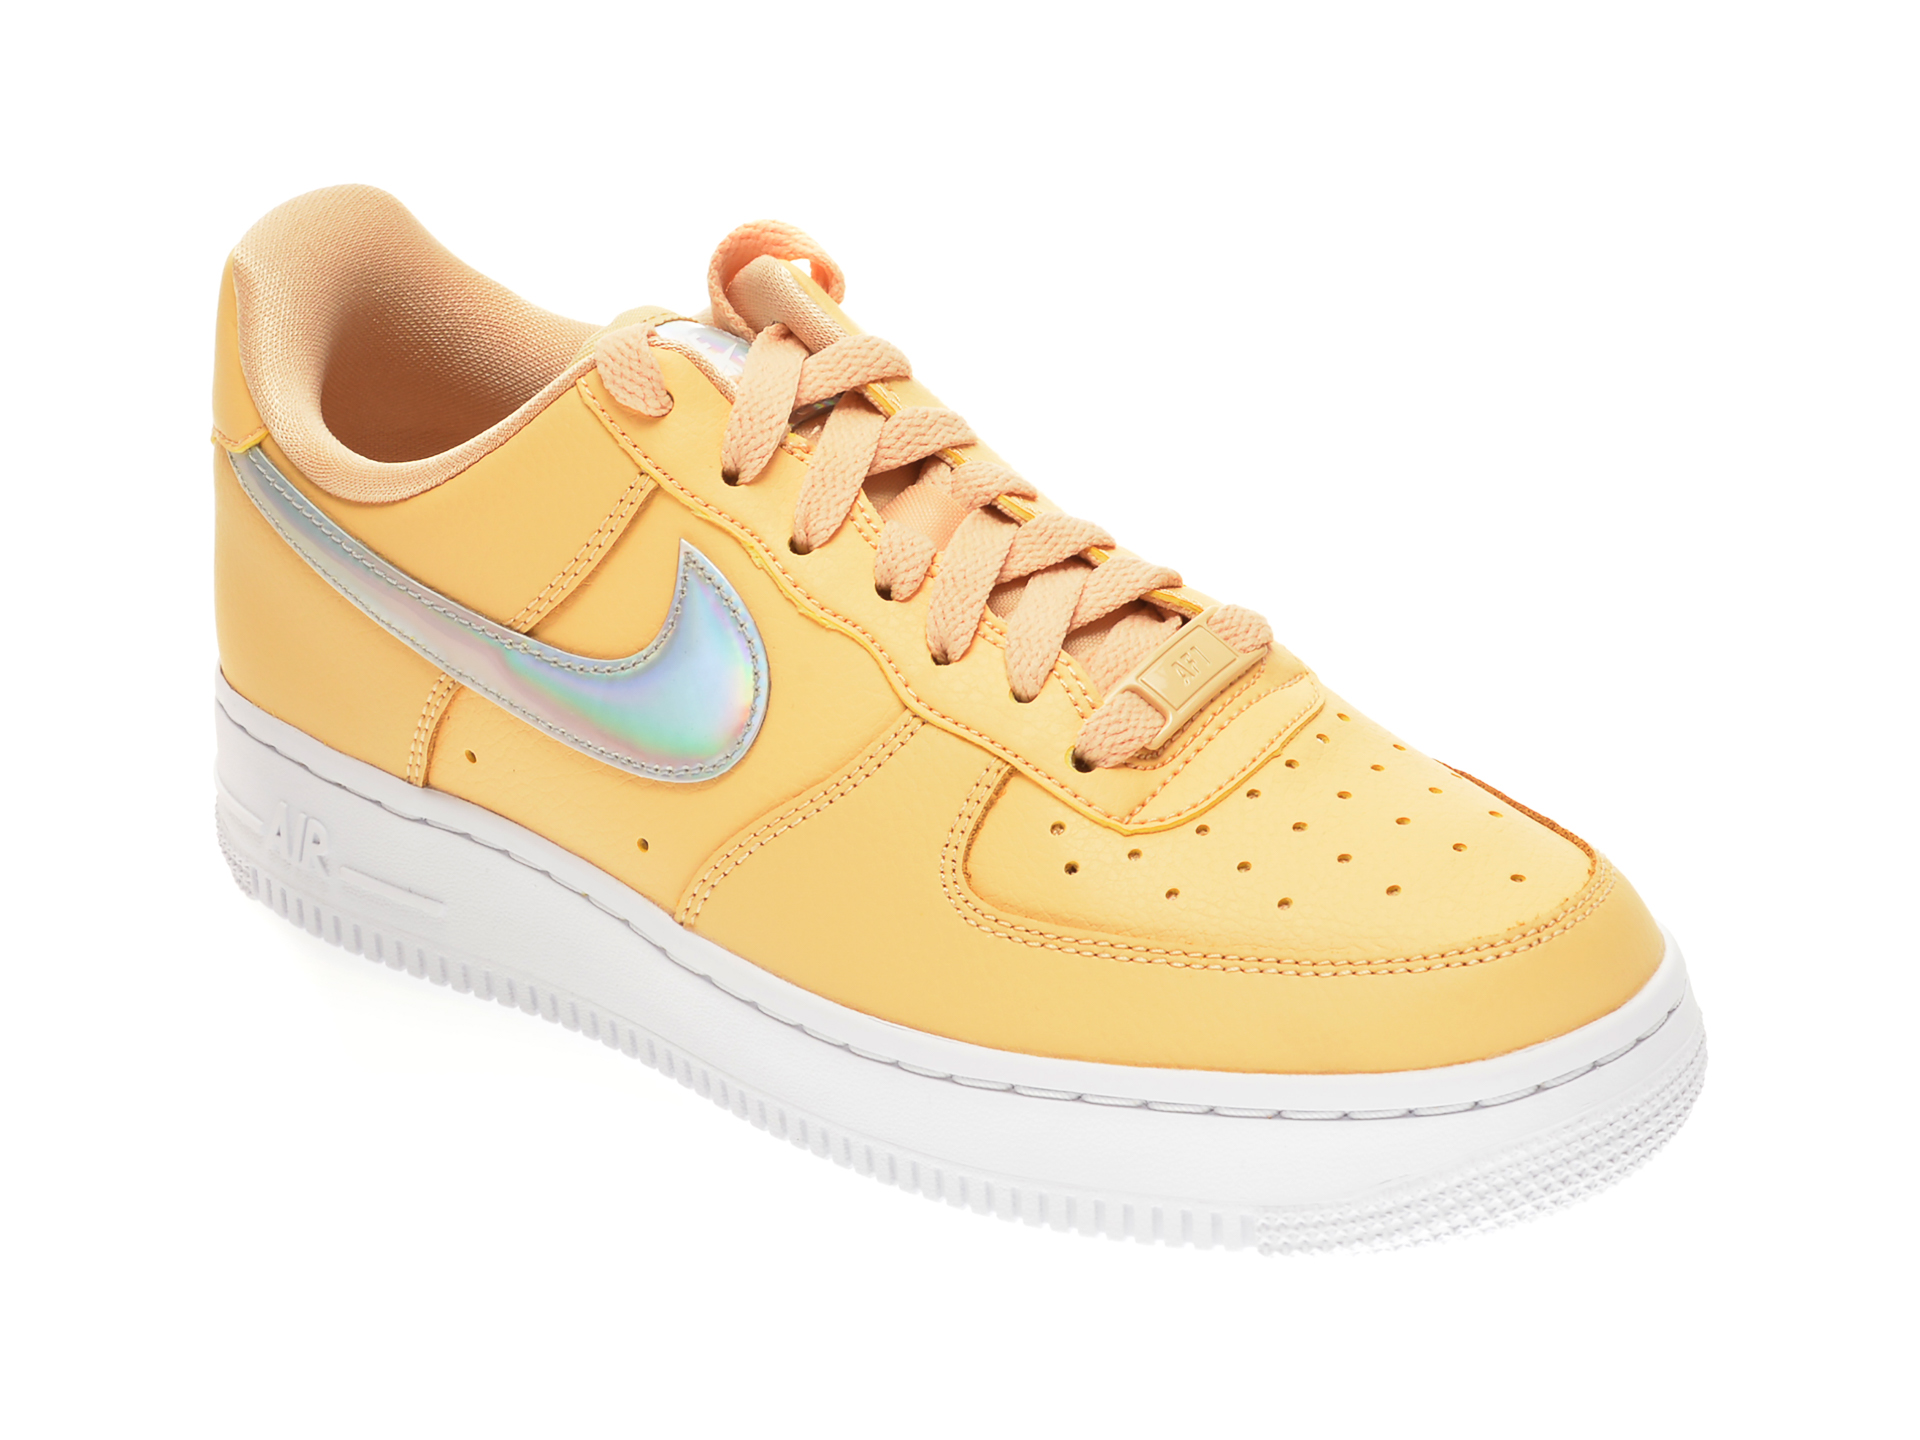 Pantofi sport NIKE galbeni, WMNS AIR FORCE 1 07, din piele naturala